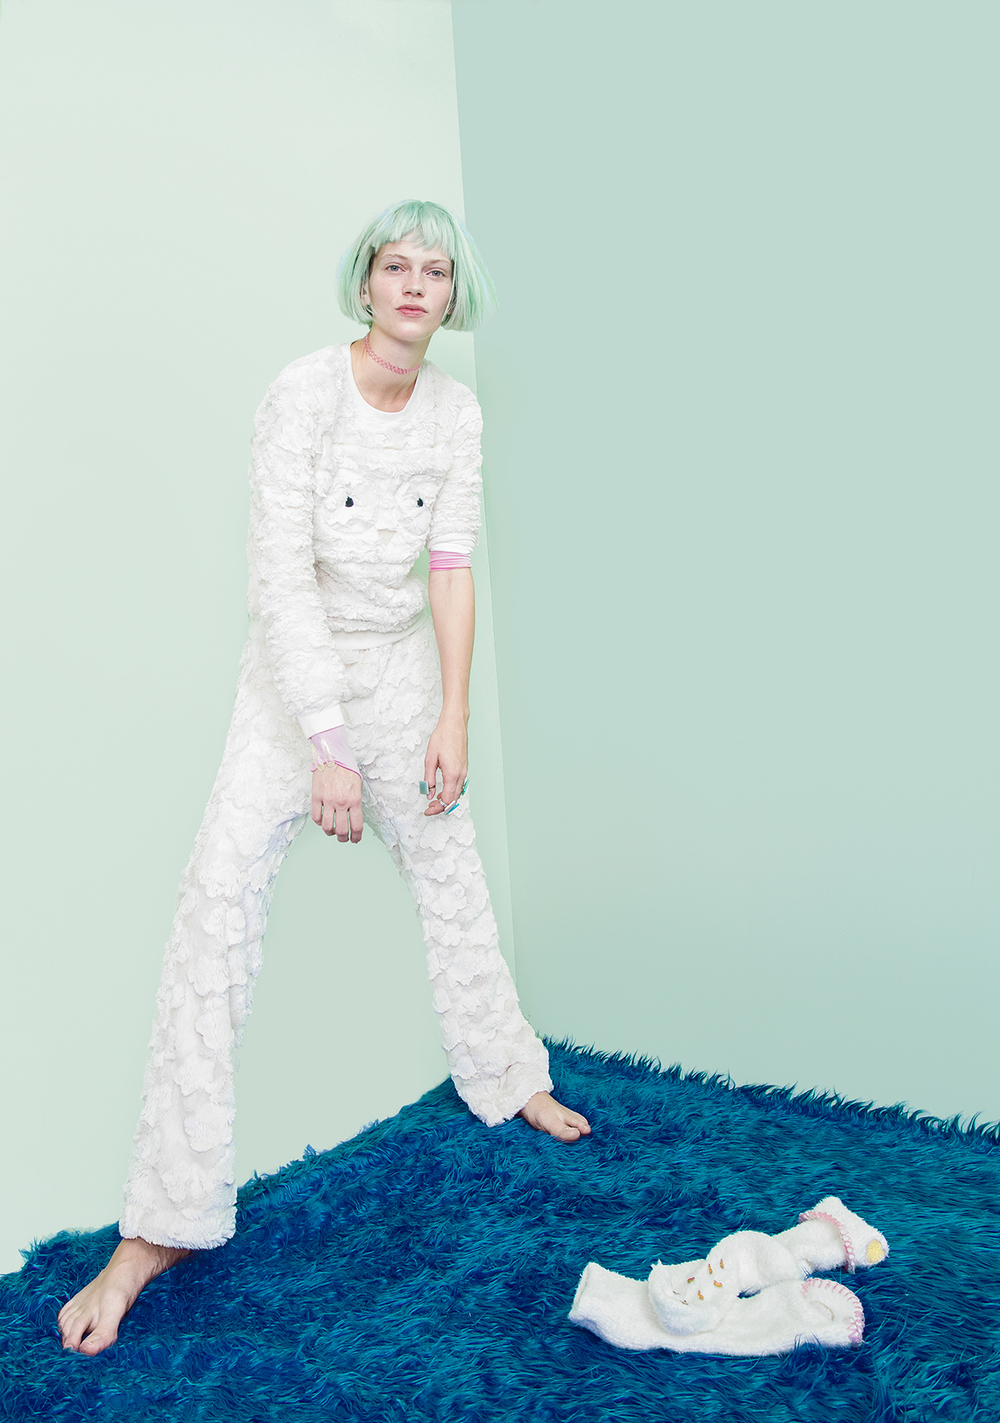 Lookbook sleepwear Oysho by Ernesto Artillo  (1).jpg